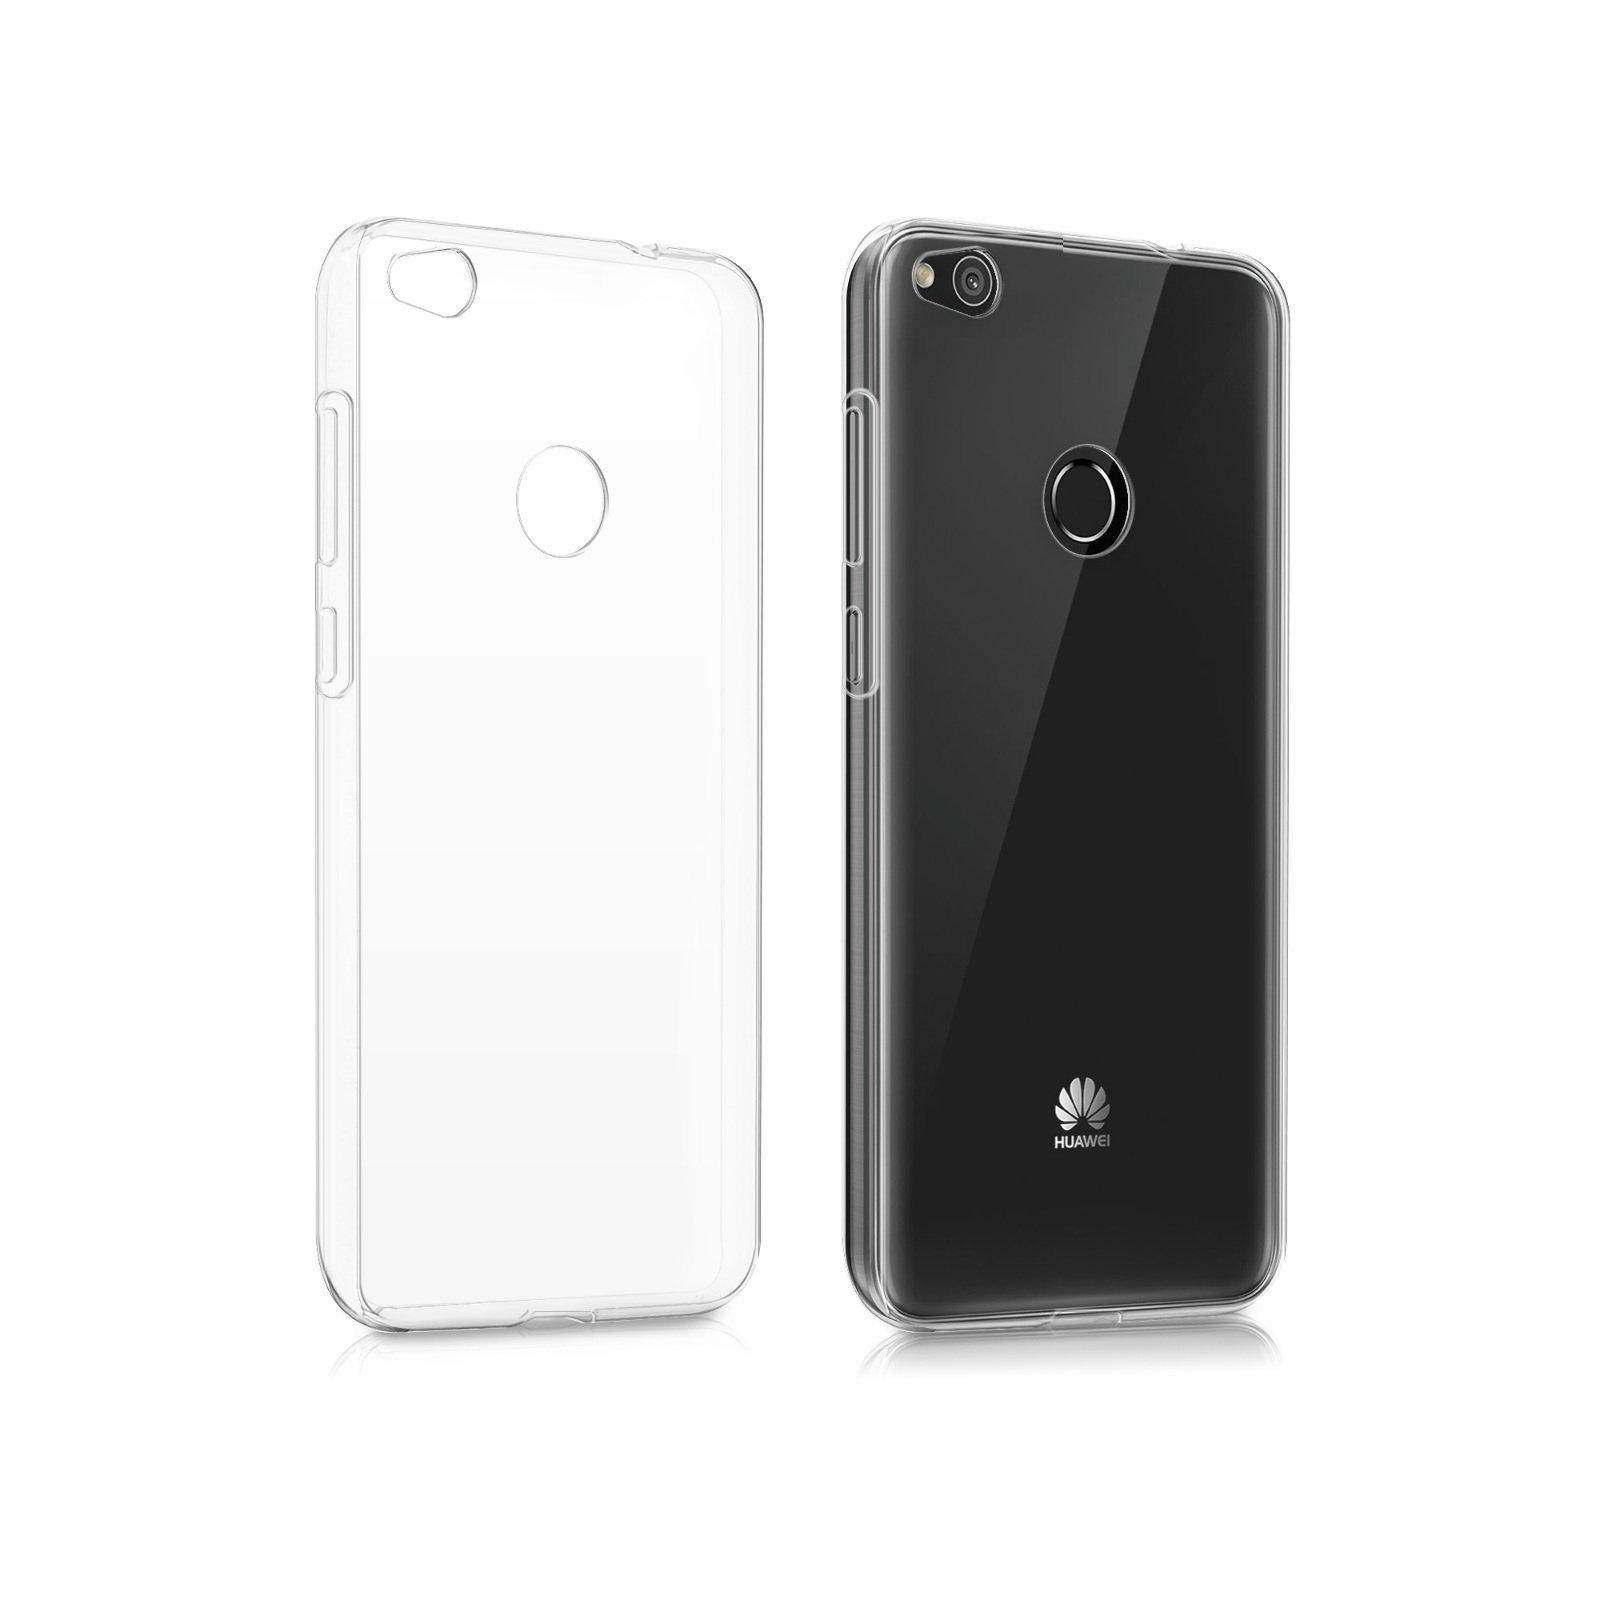 Чехол для моб. телефона SmartCase Huawei P8 Lite TPU Clear (SC-HP8L)